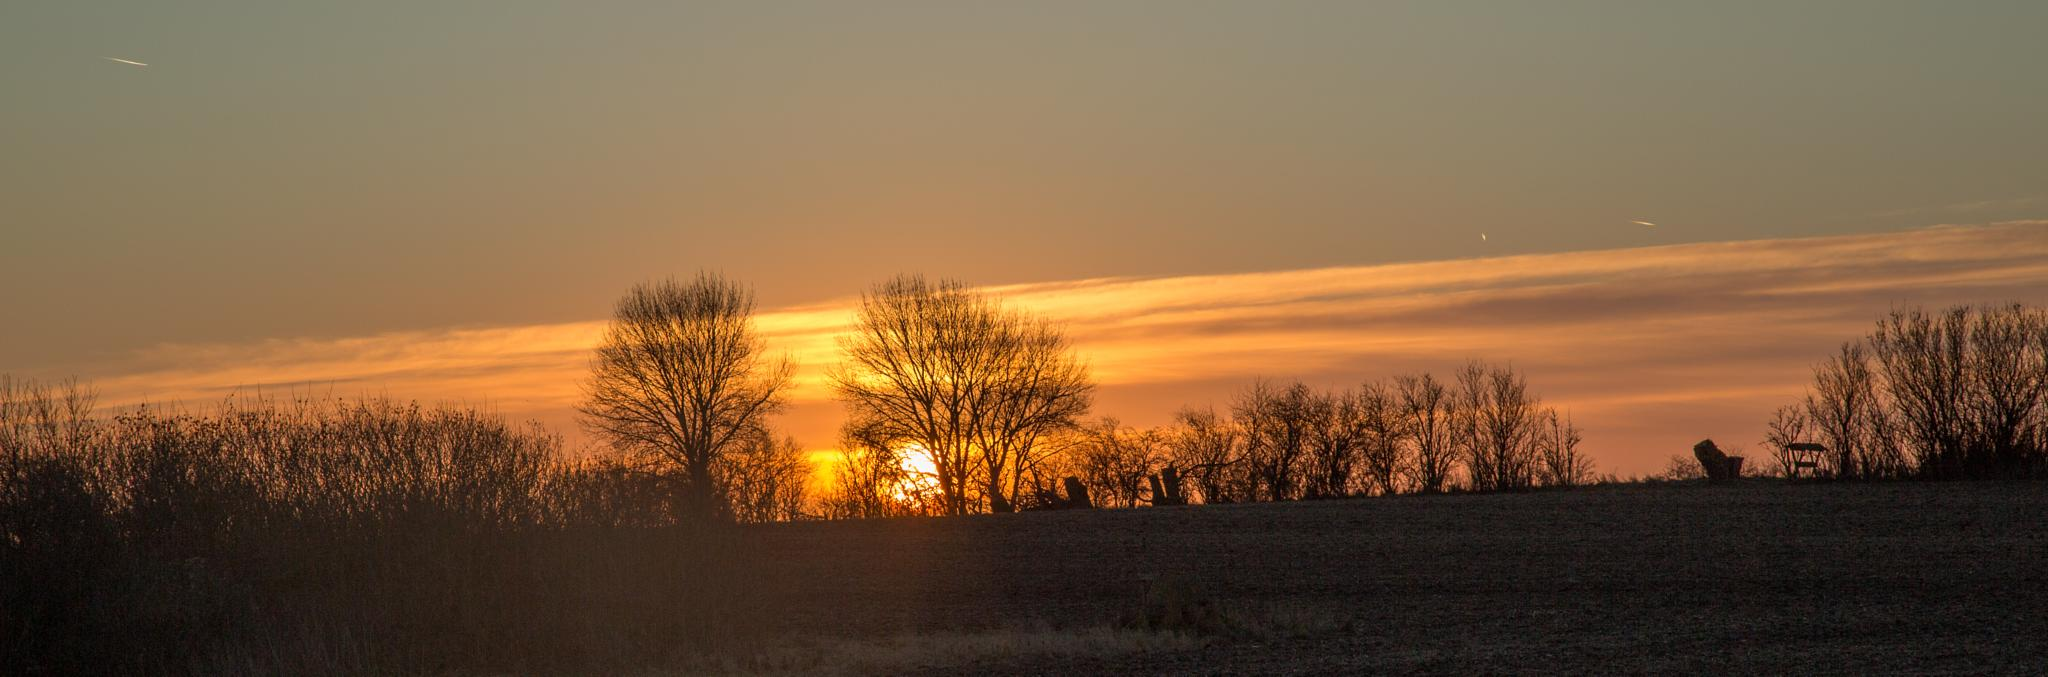 Sundown by dgwhit